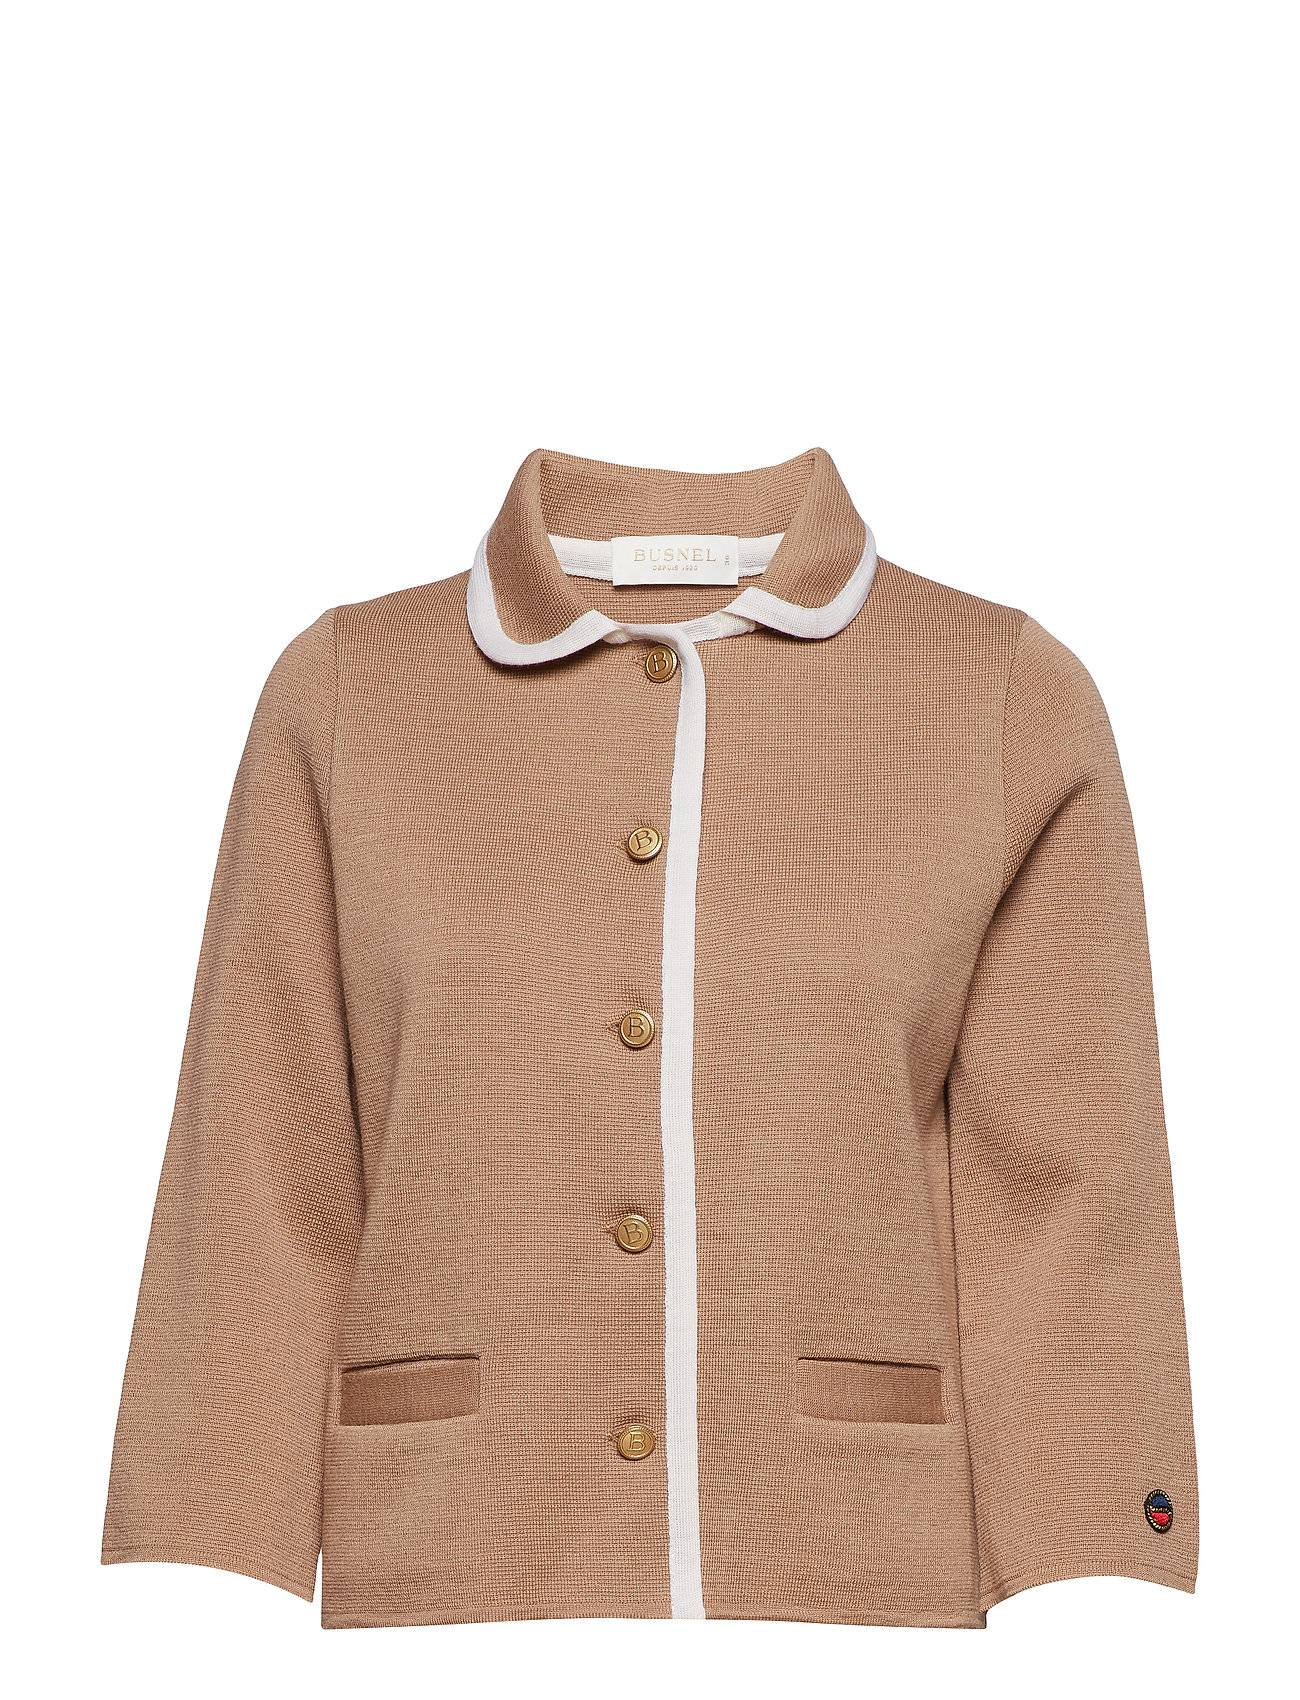 BUSNEL Sainte Colombe Jacket